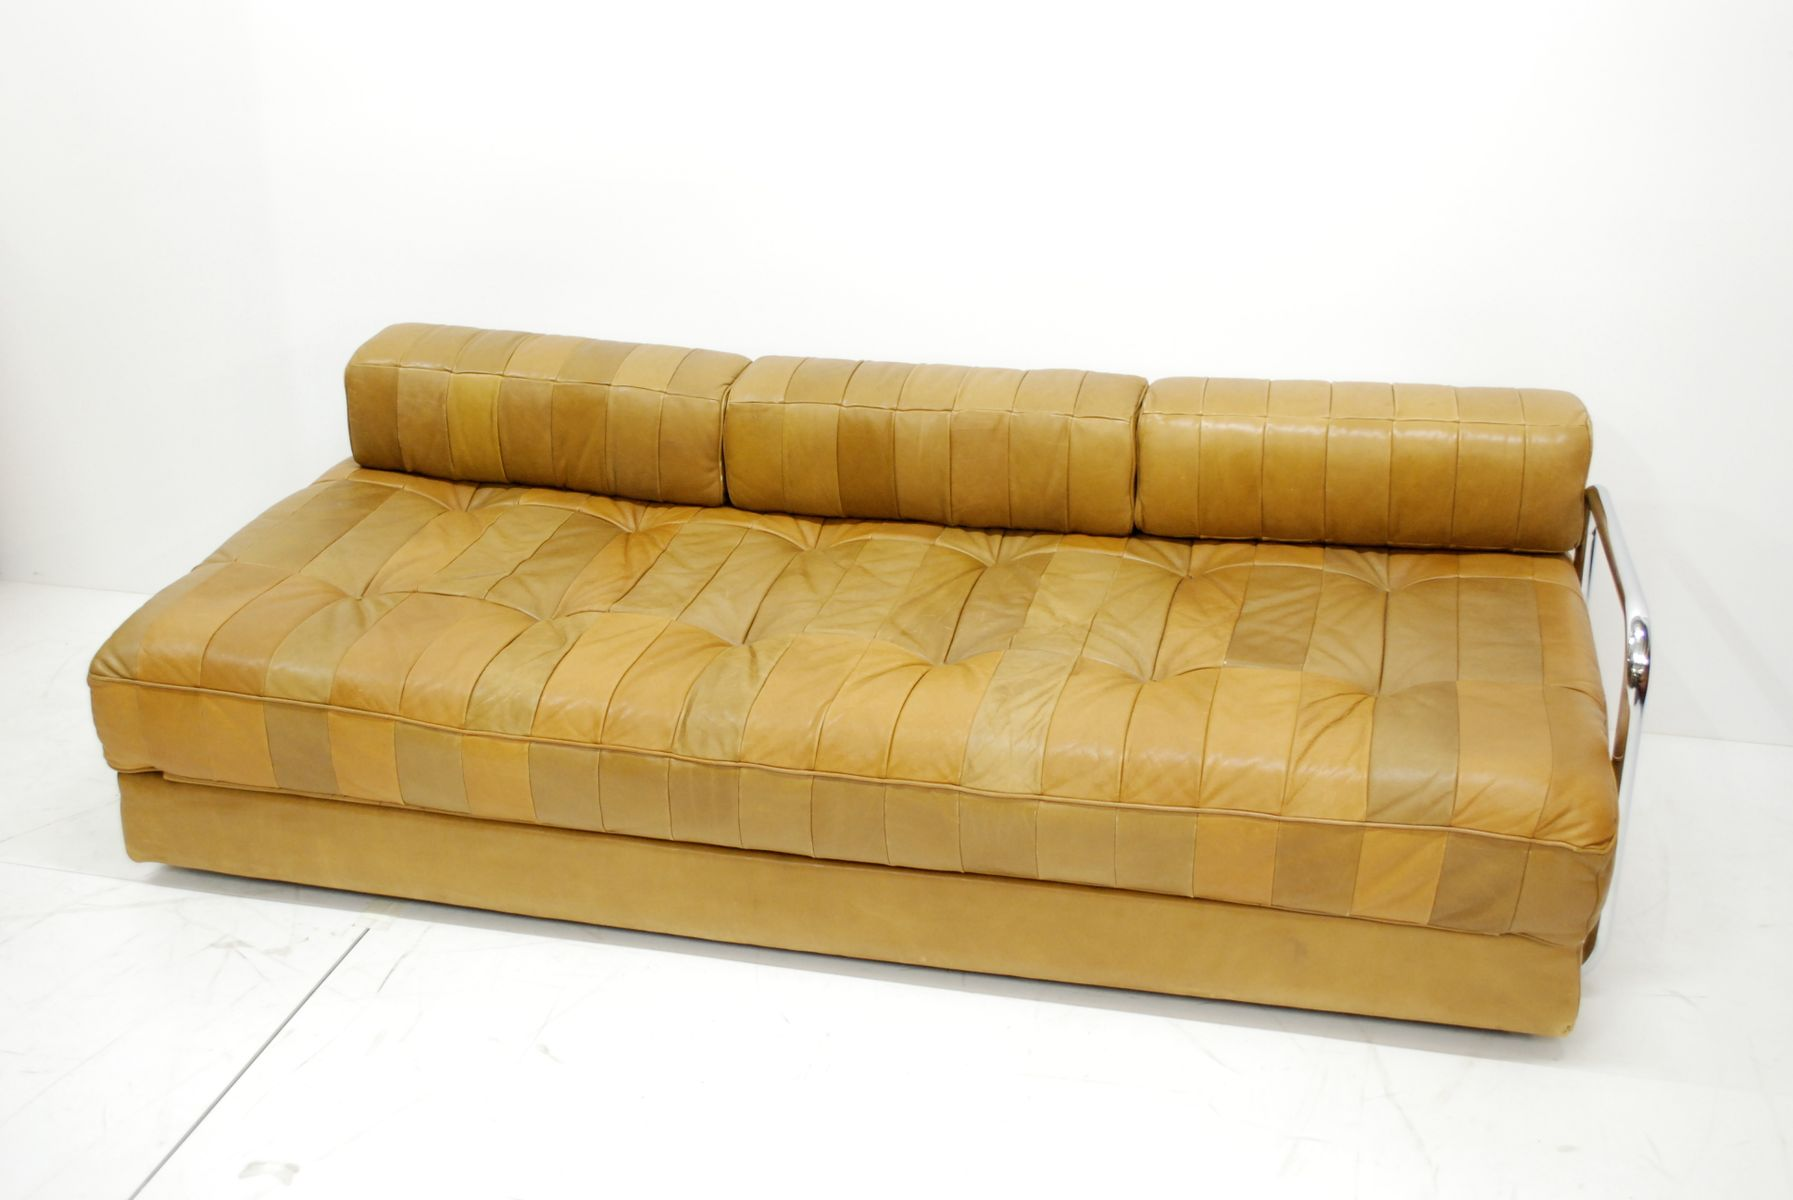 vintage caramel ds 80 schlafsofa aus leder von de sede bei pamono kaufen. Black Bedroom Furniture Sets. Home Design Ideas